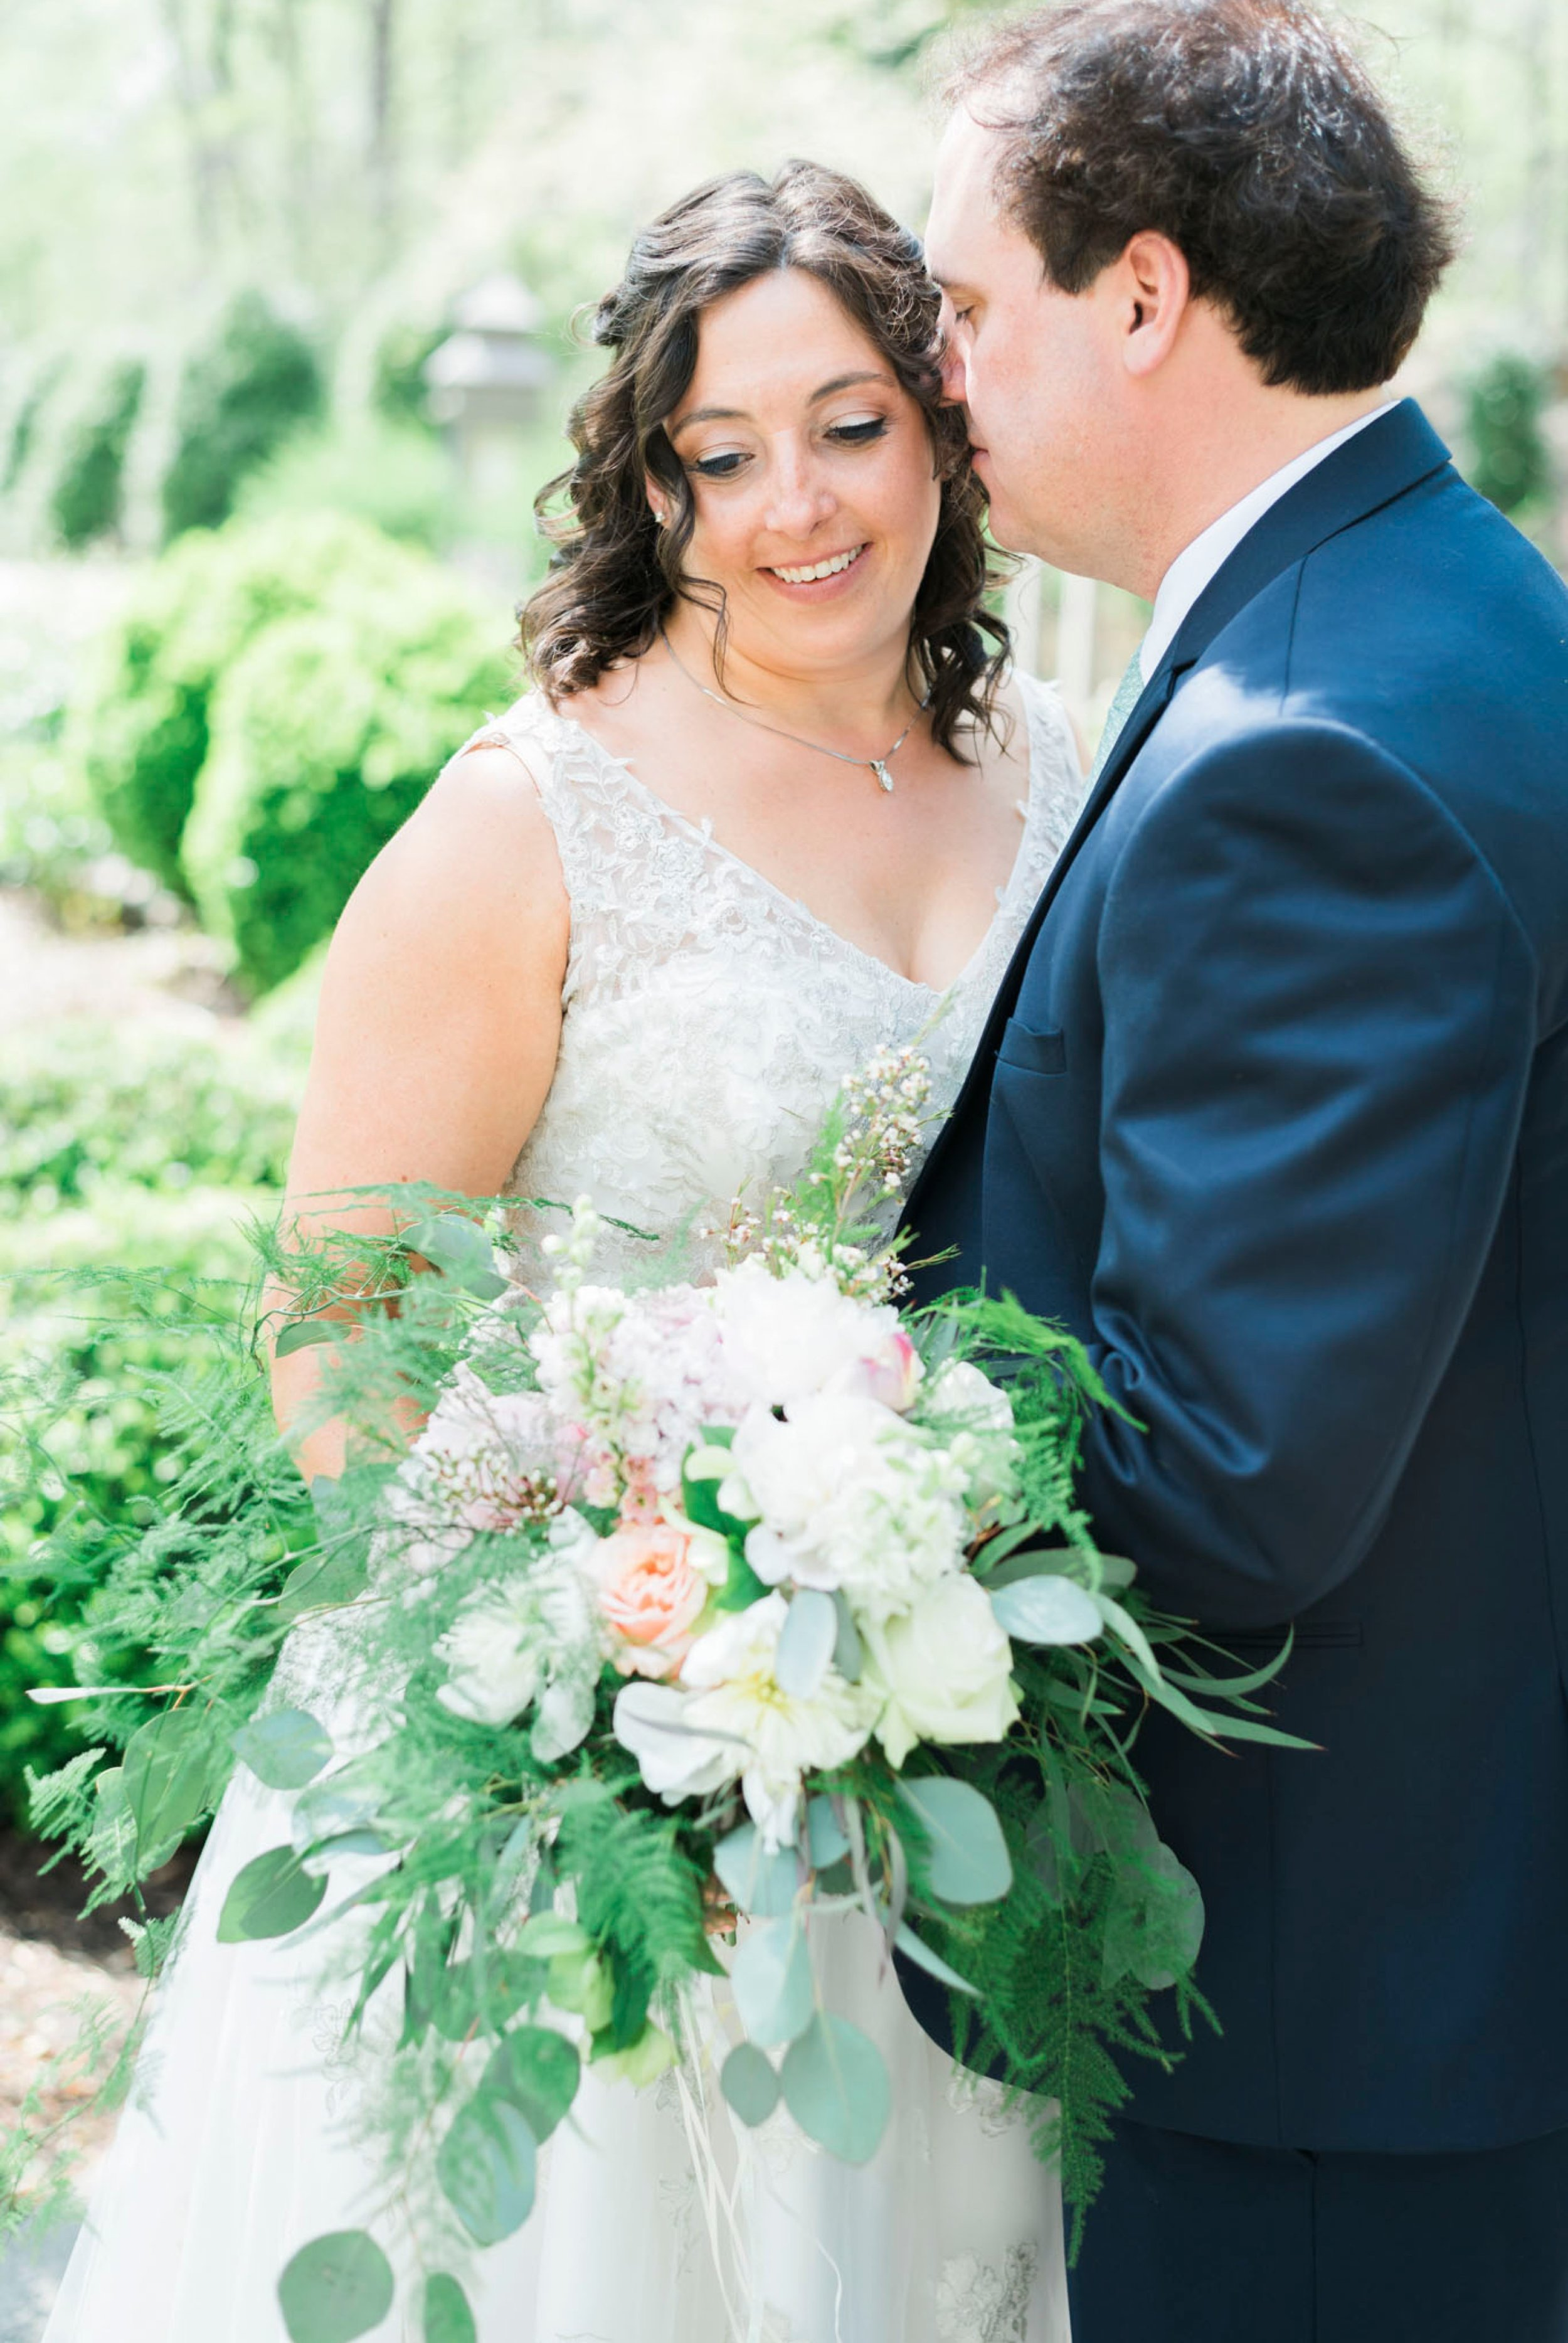 TheVirginianHotel_LynchburgVA_TheVirginianHotelWedding_Virginiaweddingphotographer_Lynchburgvawedding 26.jpg